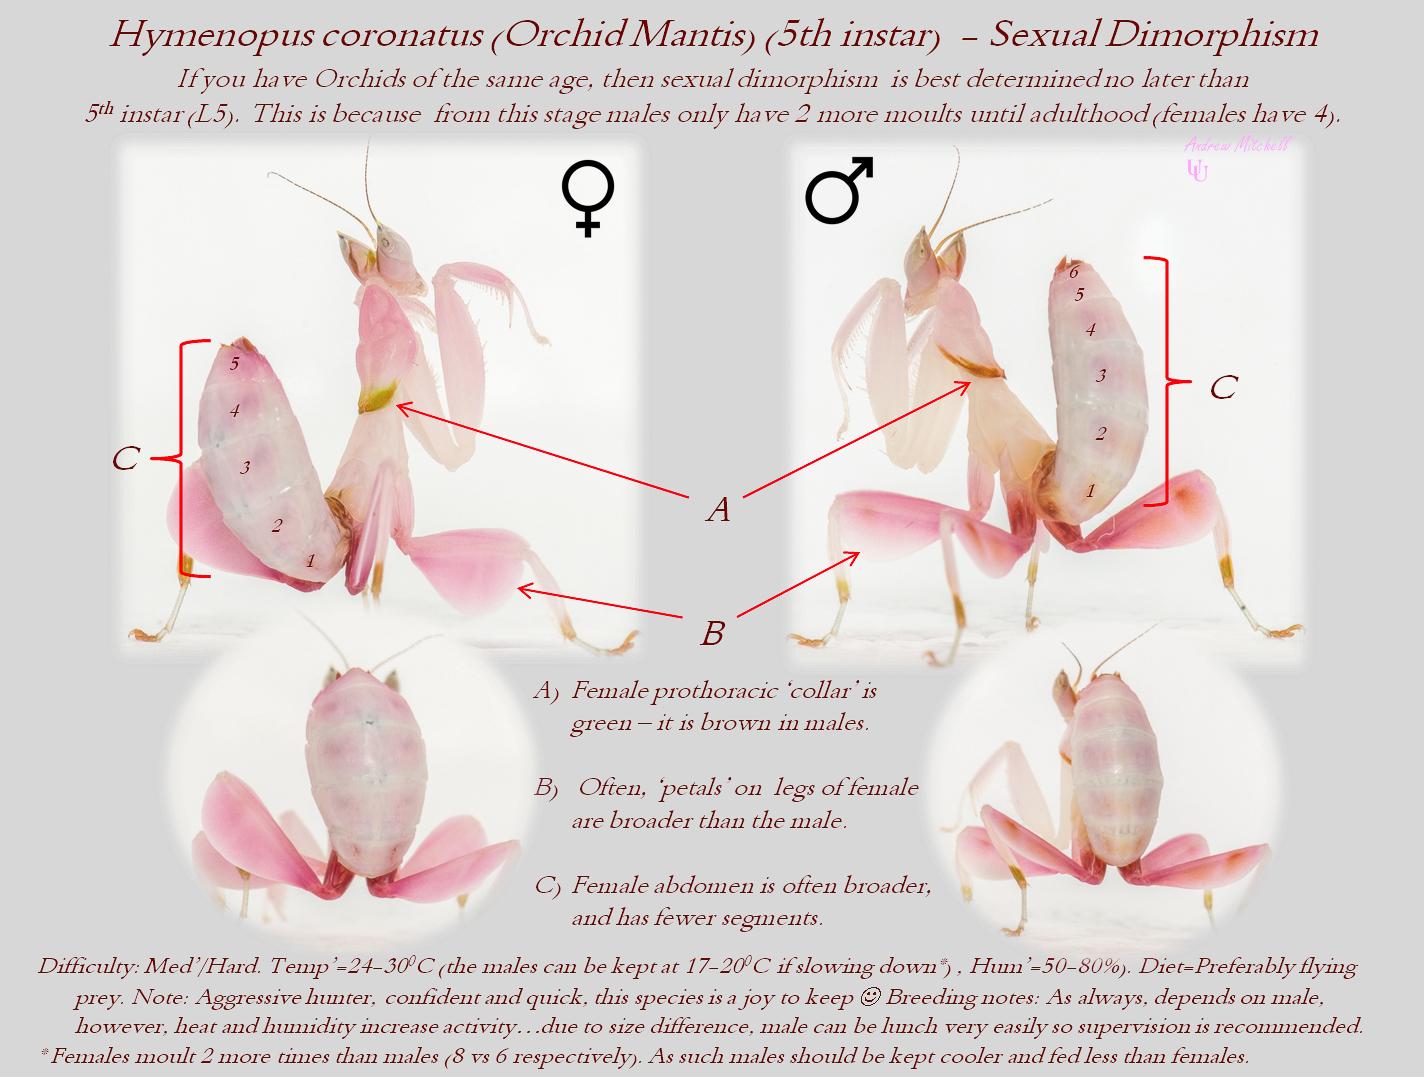 Hymenopus coronatus (Orchid Mantis) (5th instar - Sexual dimorphism)